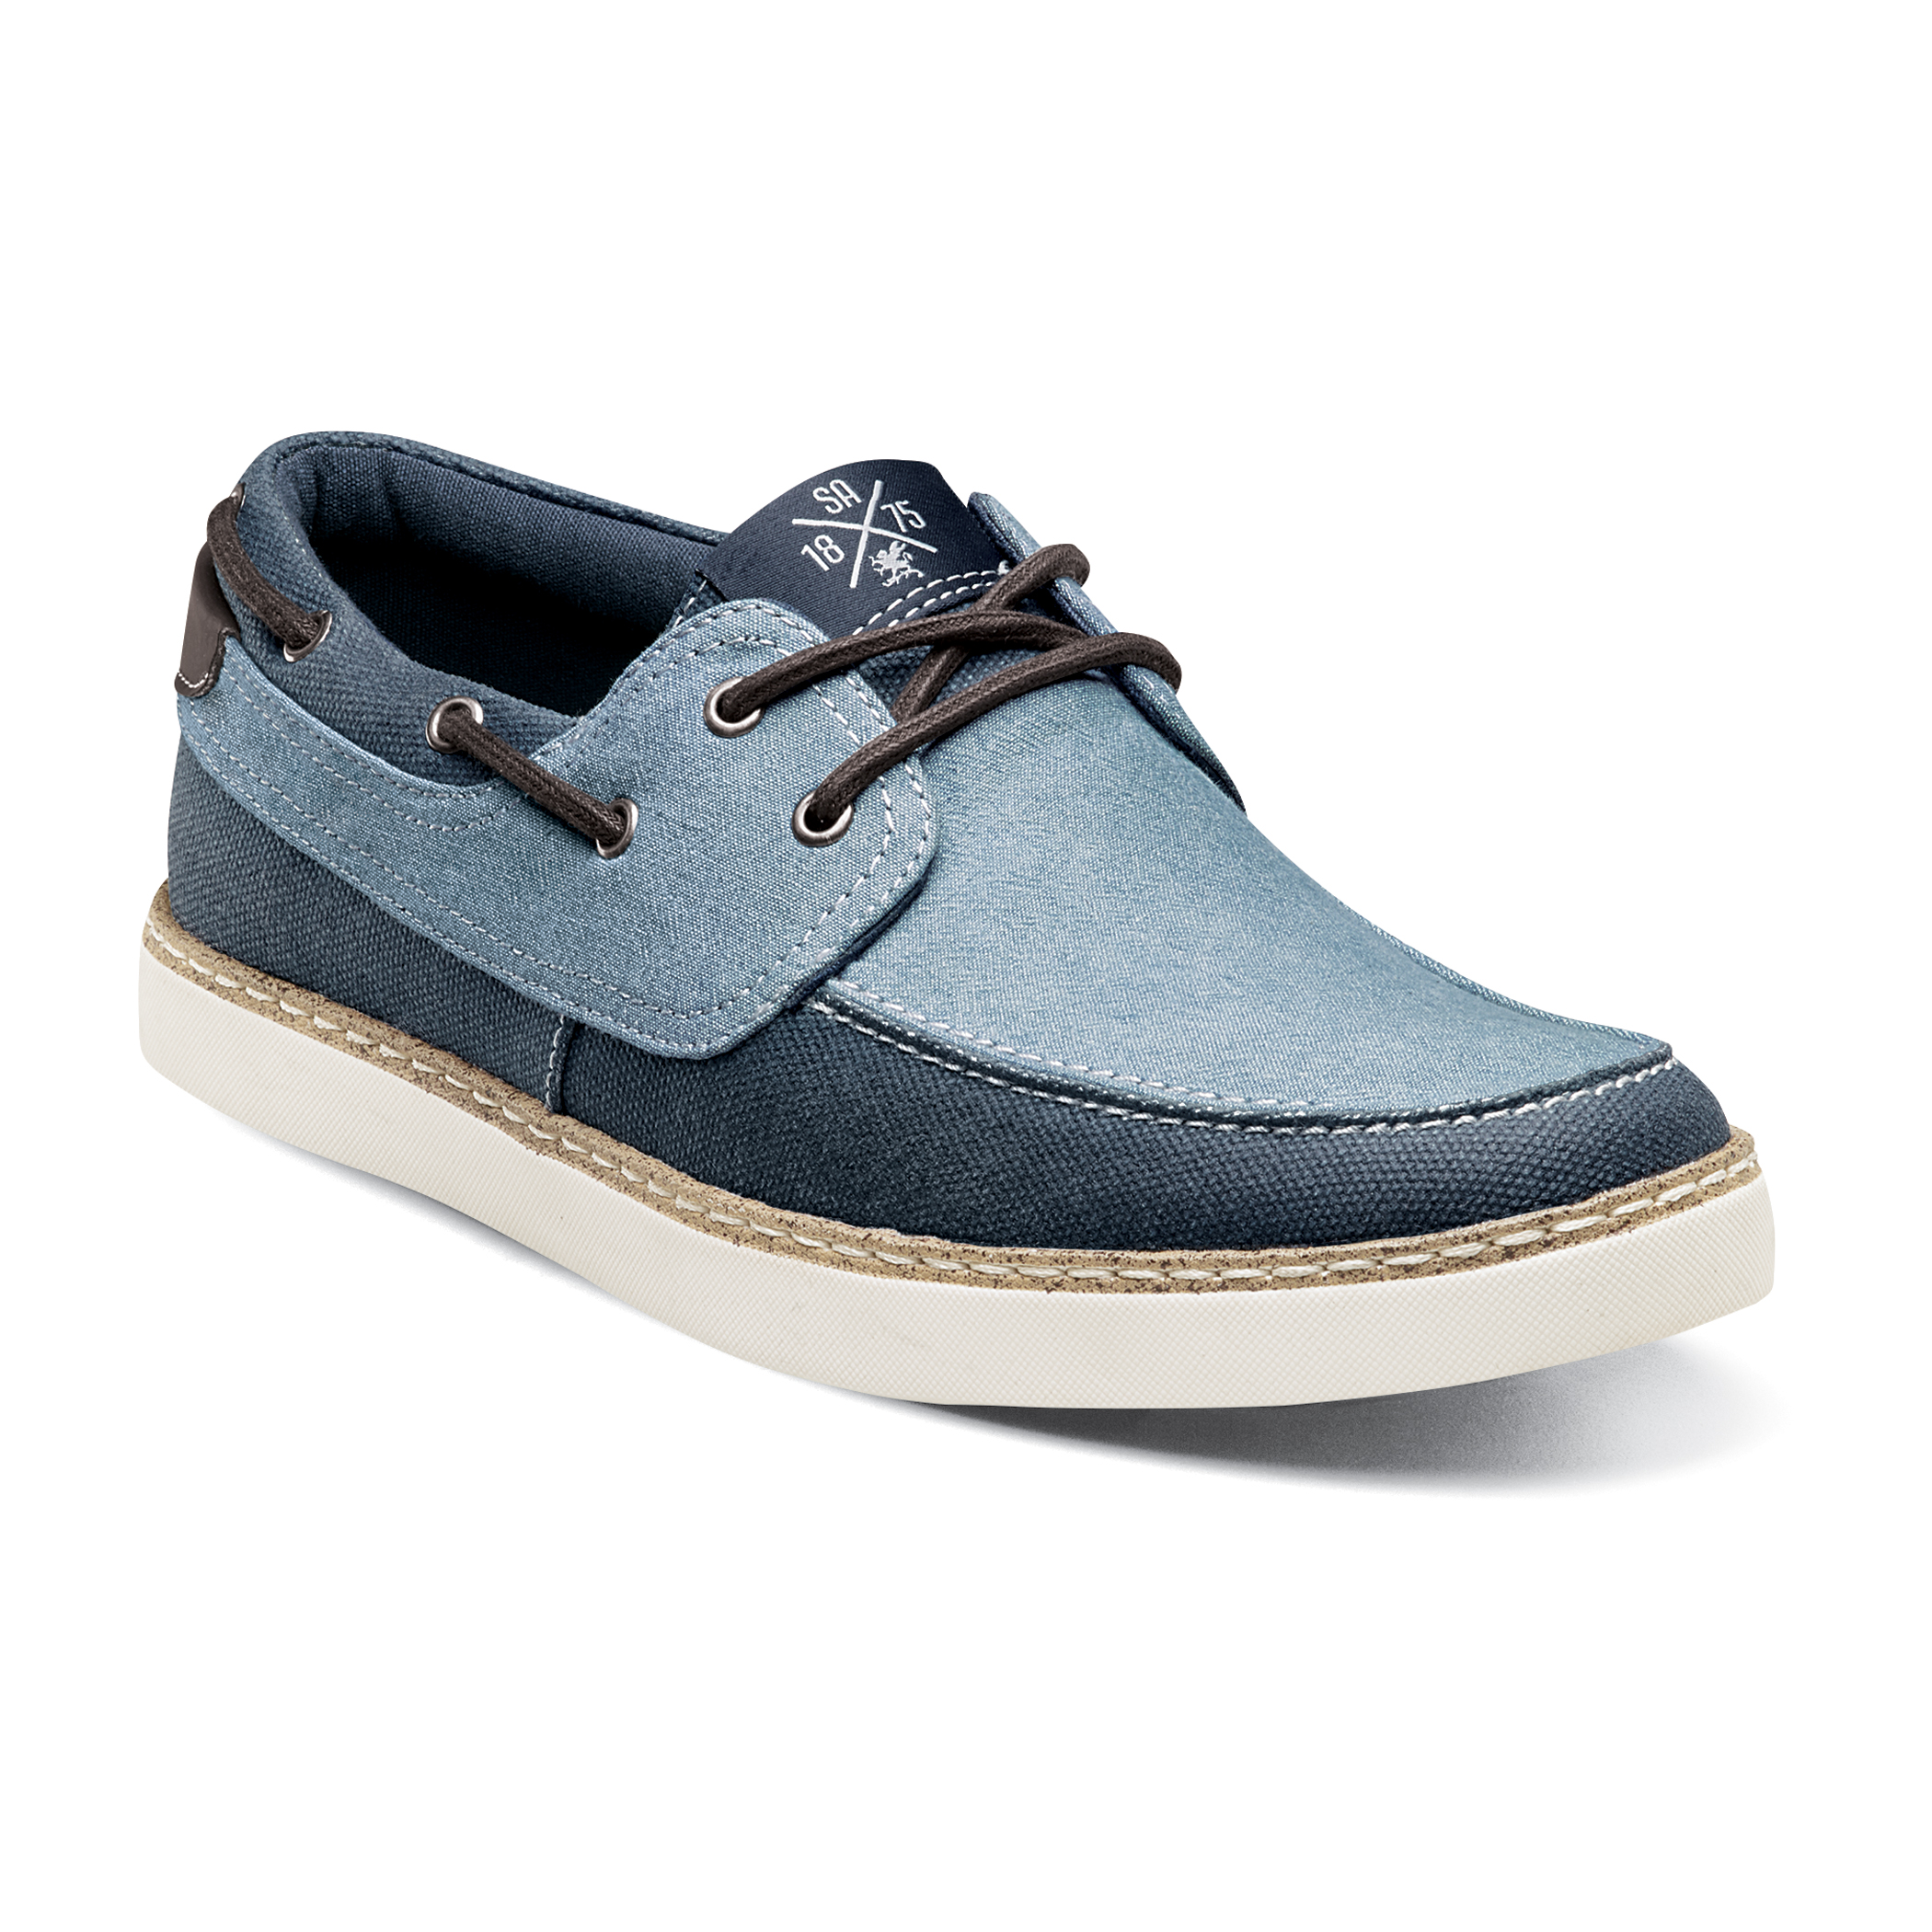 "Stacy Adams ""Tailwind"" Light Blue / Blue Denim Moc Toe Shoes 53415"